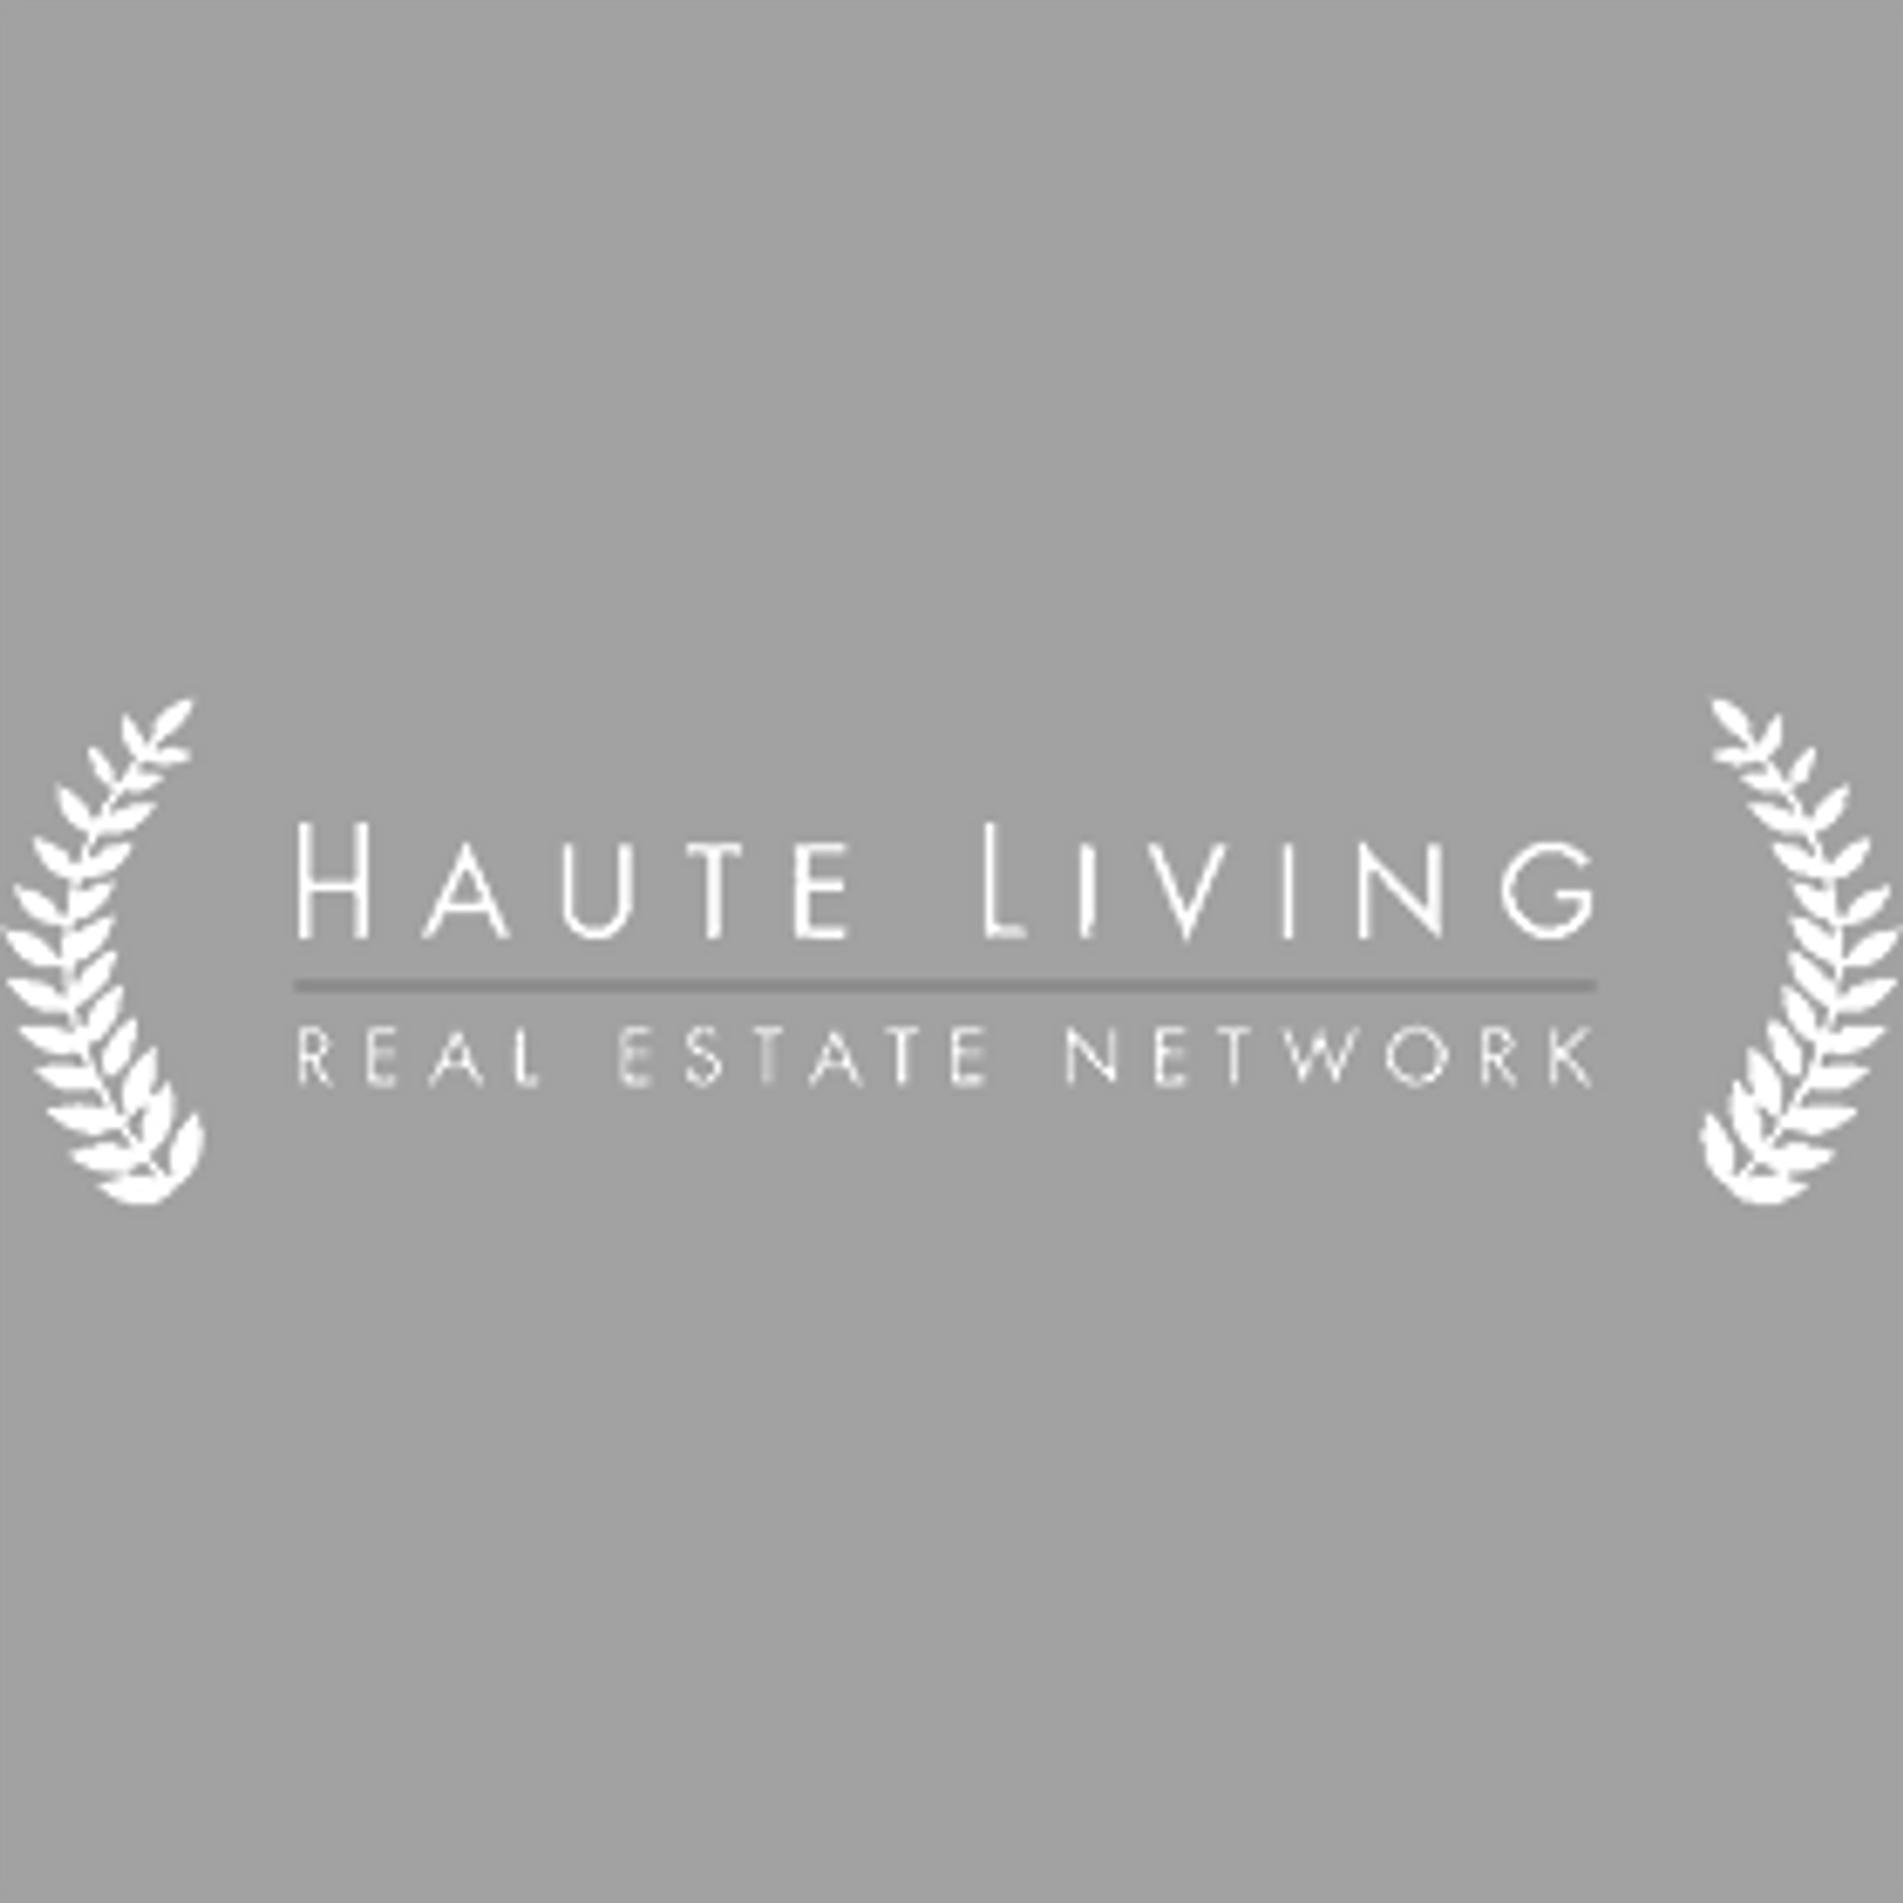 haute_living-280.png